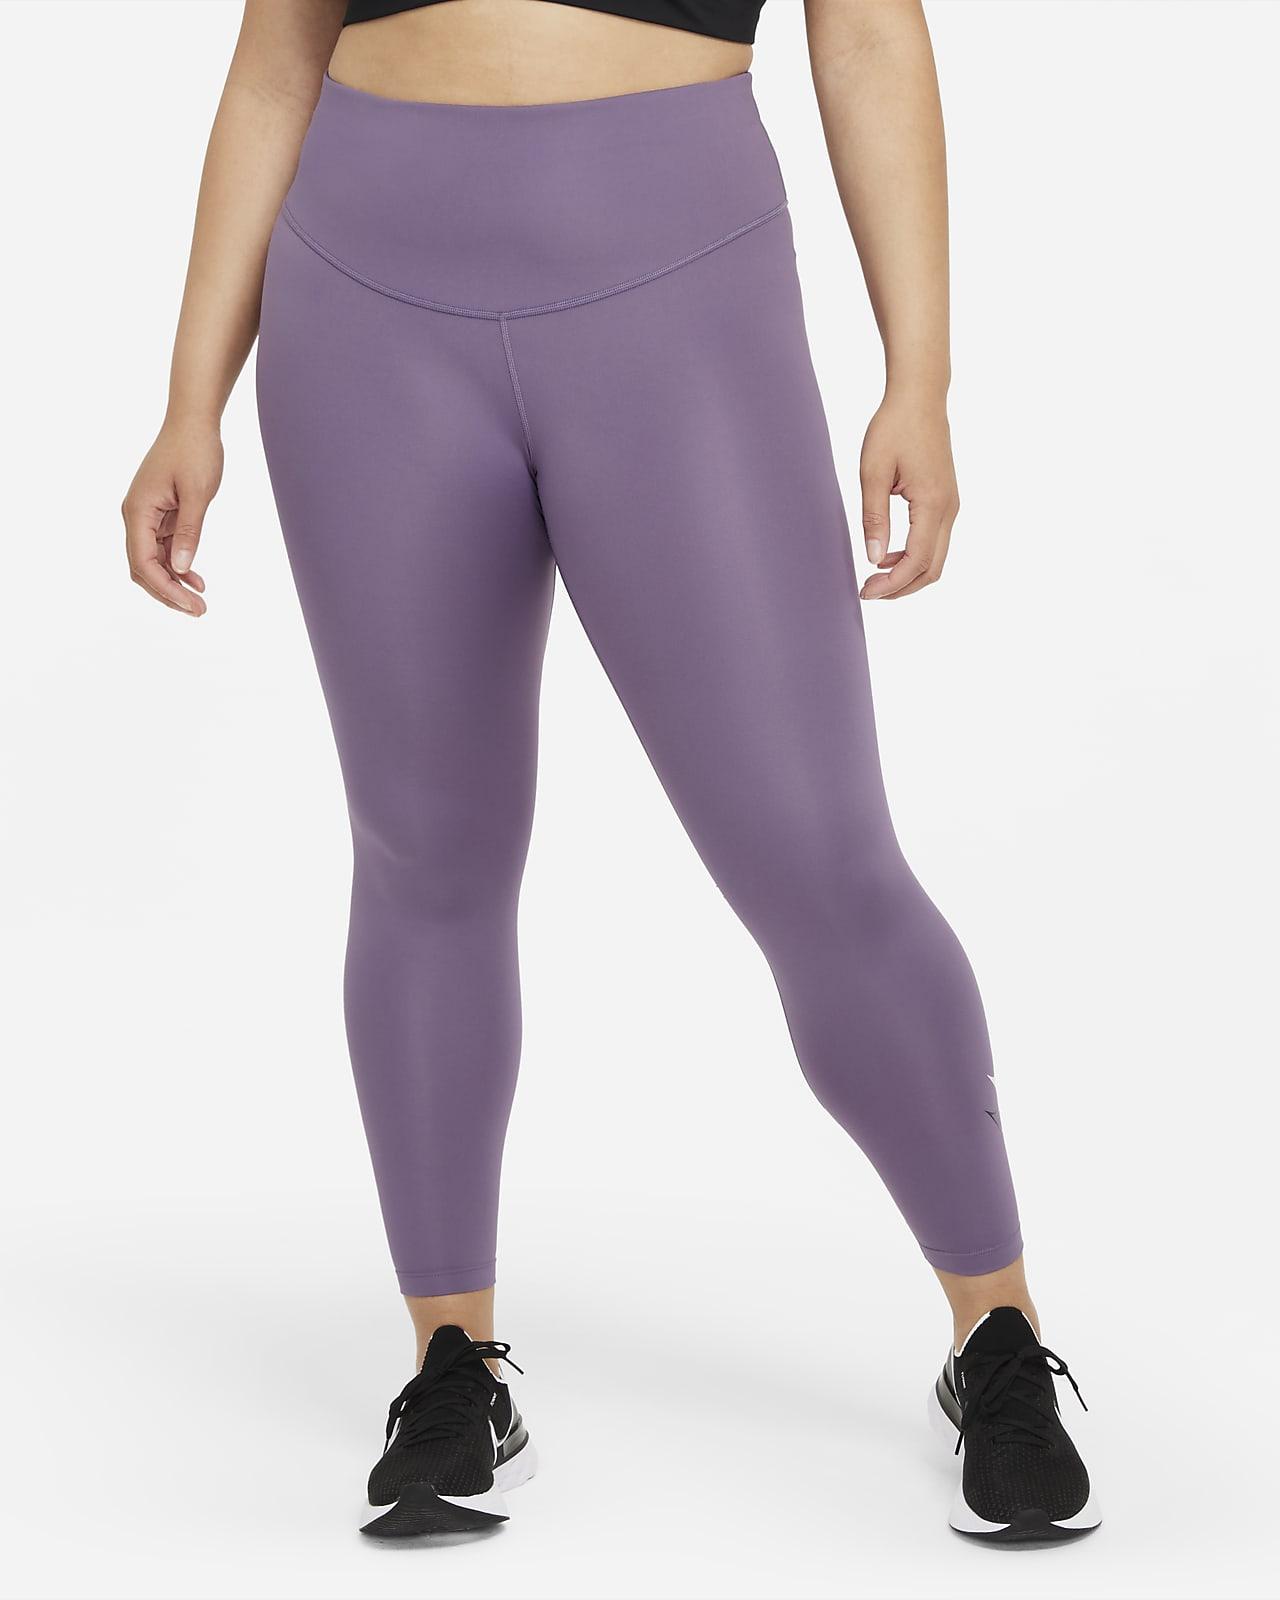 Nike Dri-FIT Swoosh Run Women's Mid-Rise 7/8 Running Leggings (Plus Size)